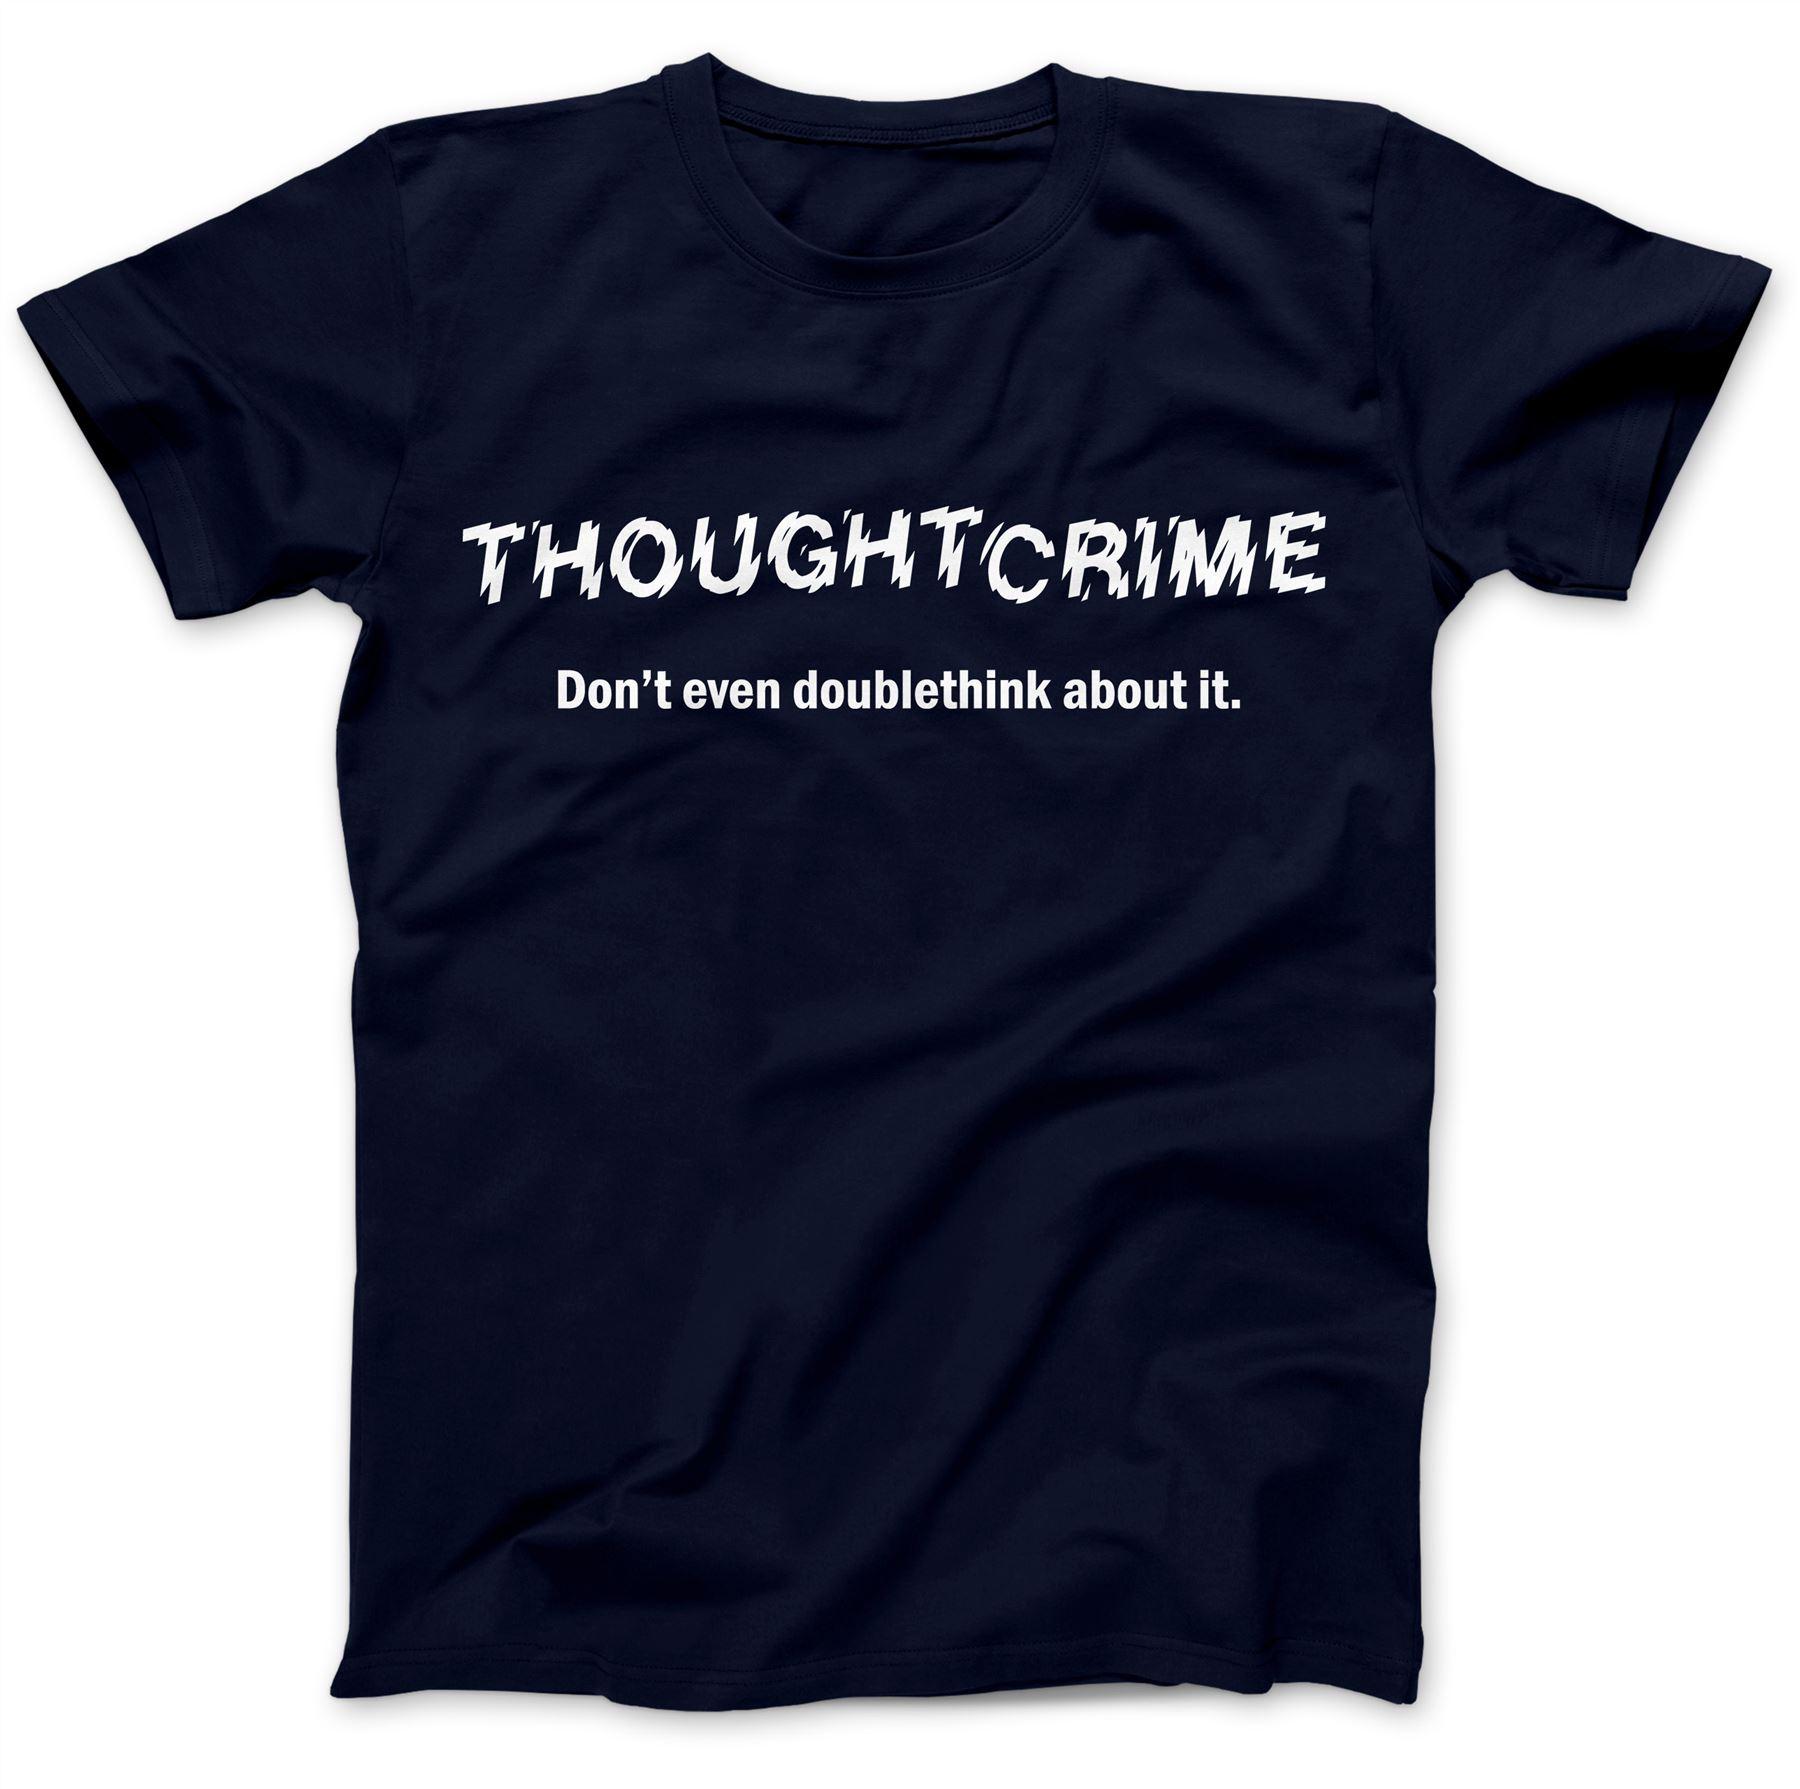 1984-Thought-Crime-George-Orwell-T-Shirt-100-Premium-Cotton-Animal-Farm miniatuur 17